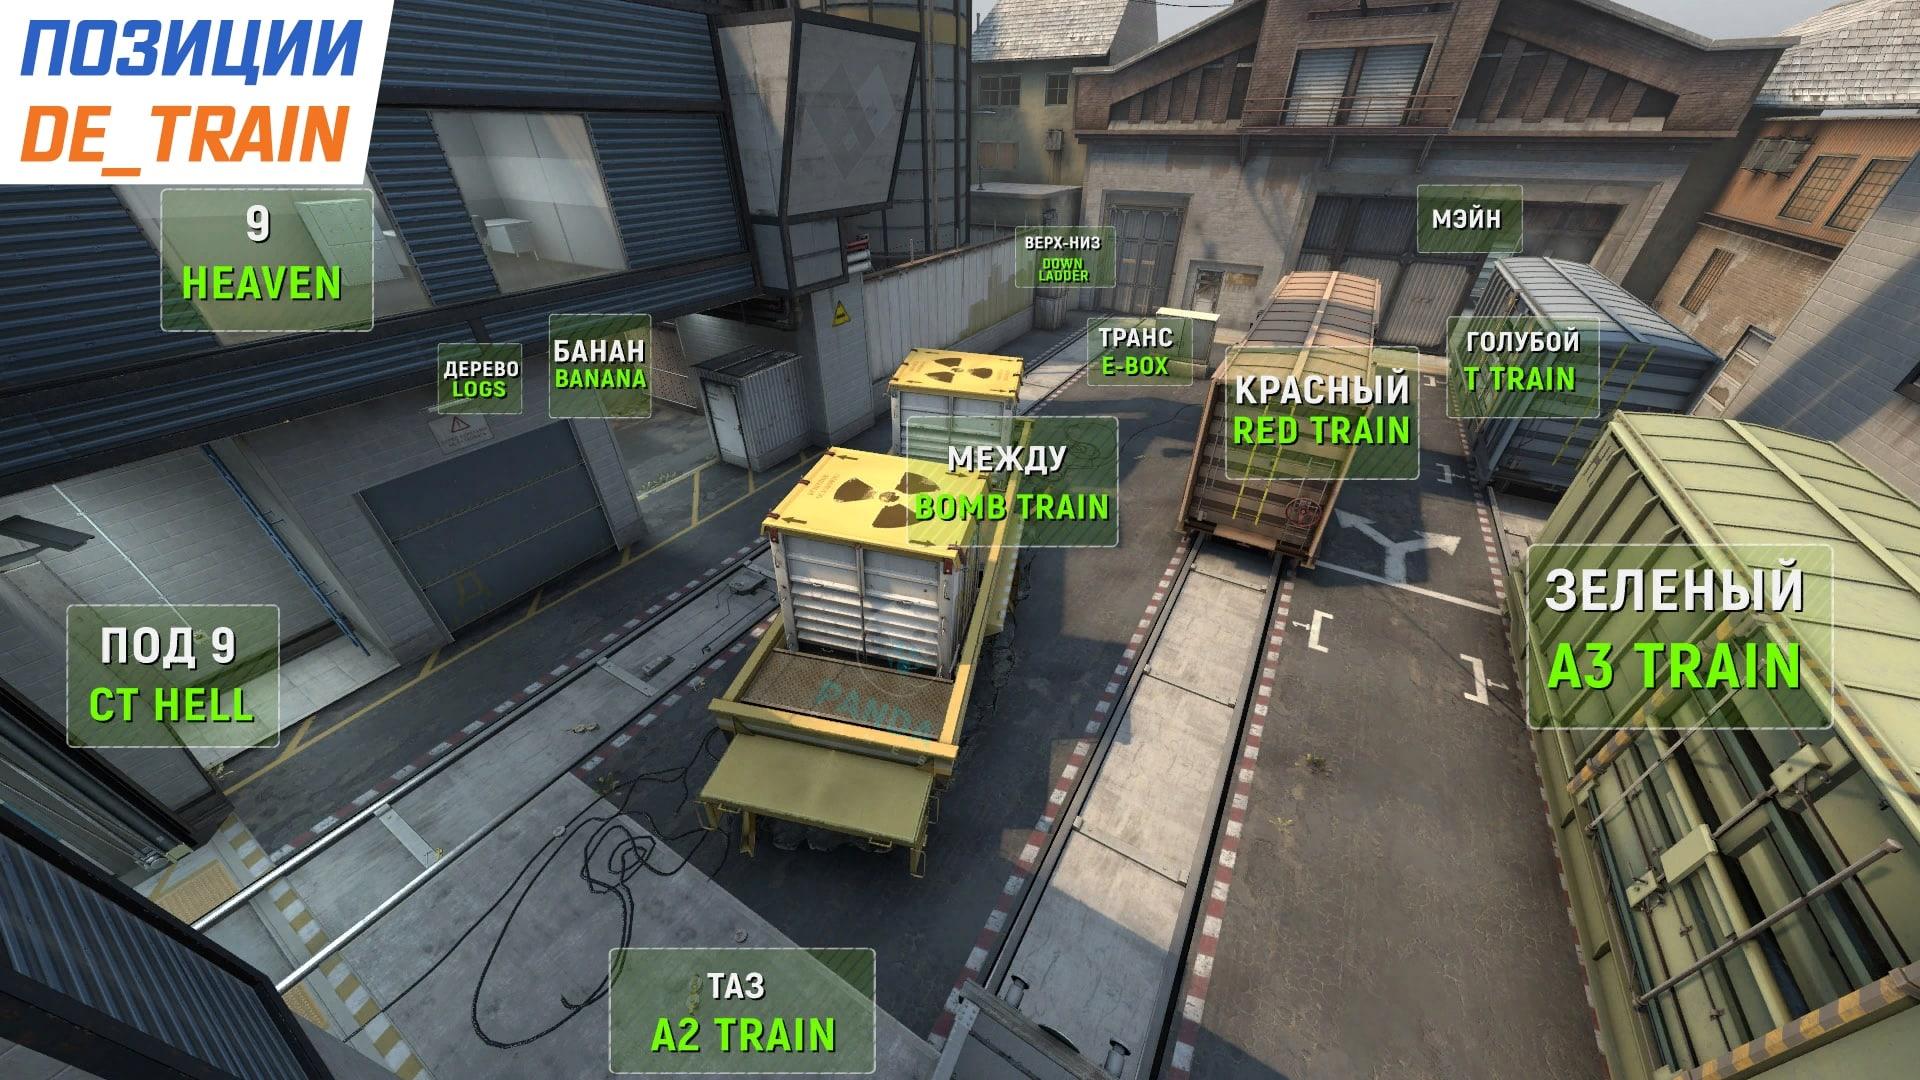 Позиции на карте de_train в CS:GO